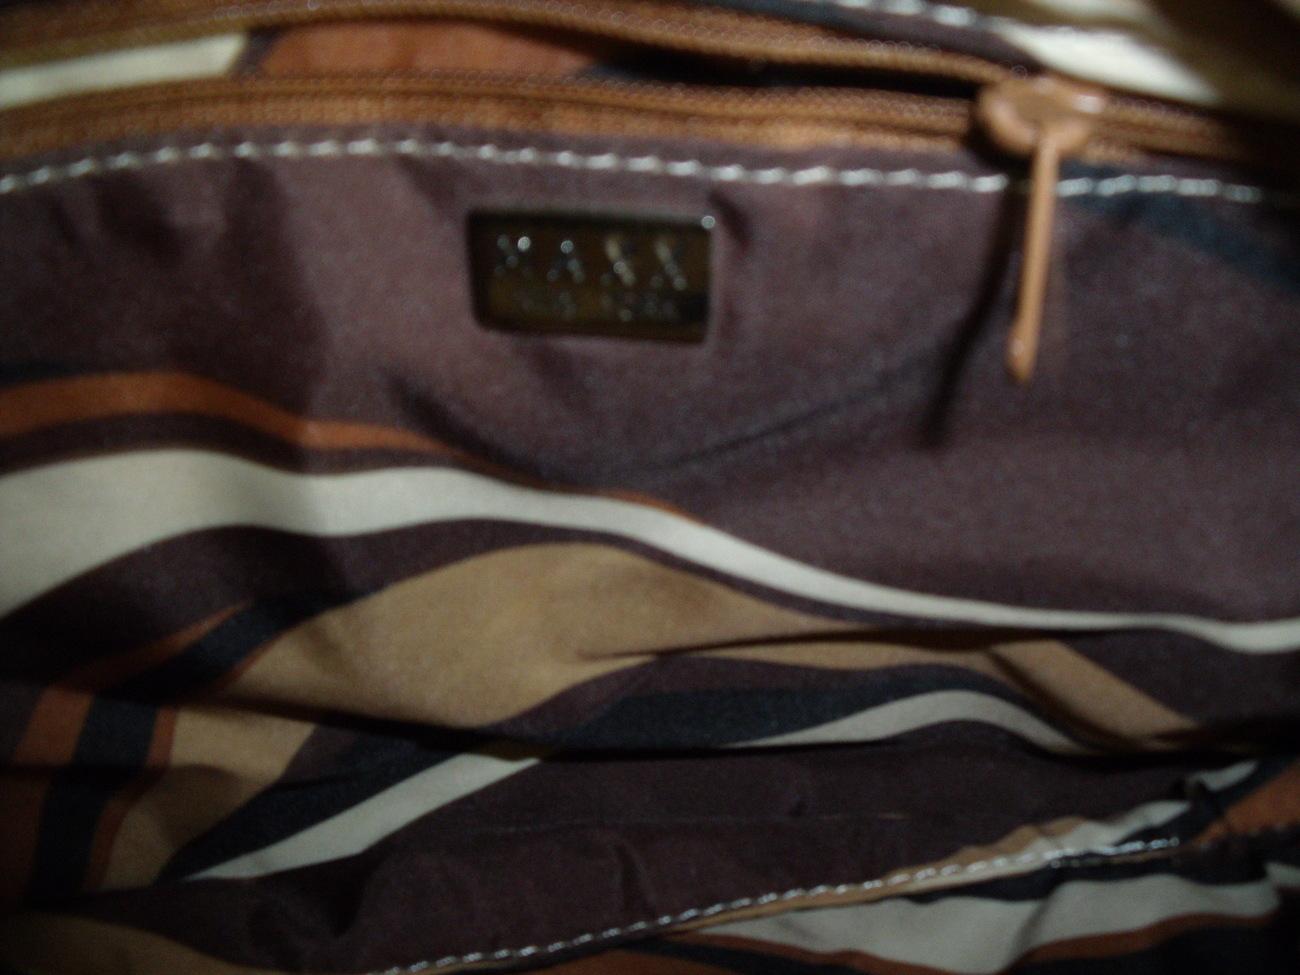 Maxx of New York microfiber shoulder or cross body bag